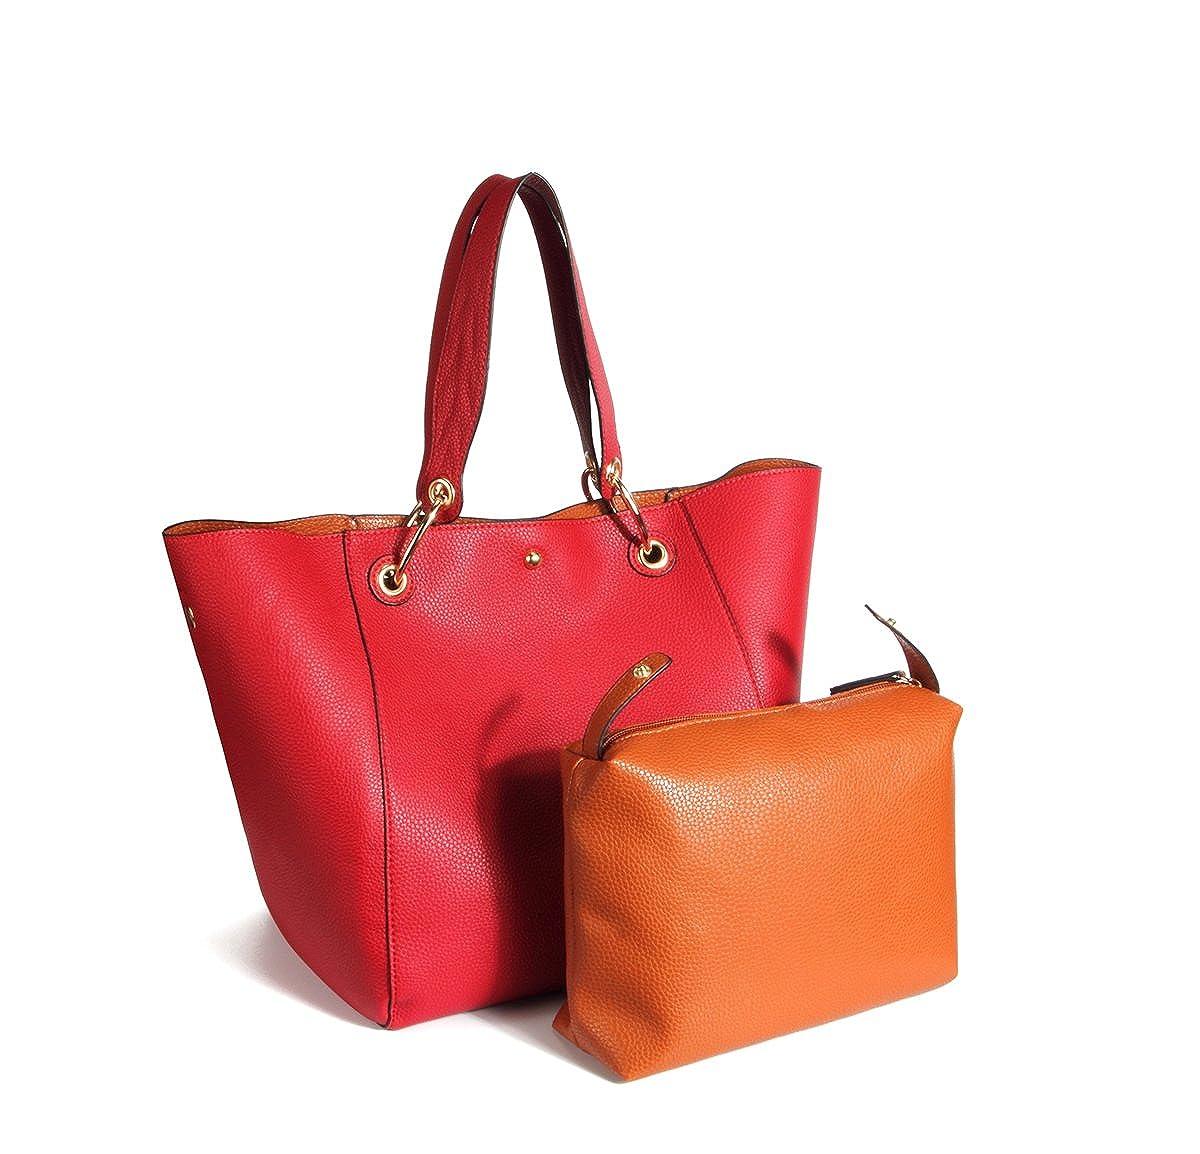 KAMIERFA Sac Seau Tote Femme /à Main Bandouli/ère Epaule Shopper Cabas en Cuir PU Grande Capacit/é Chic